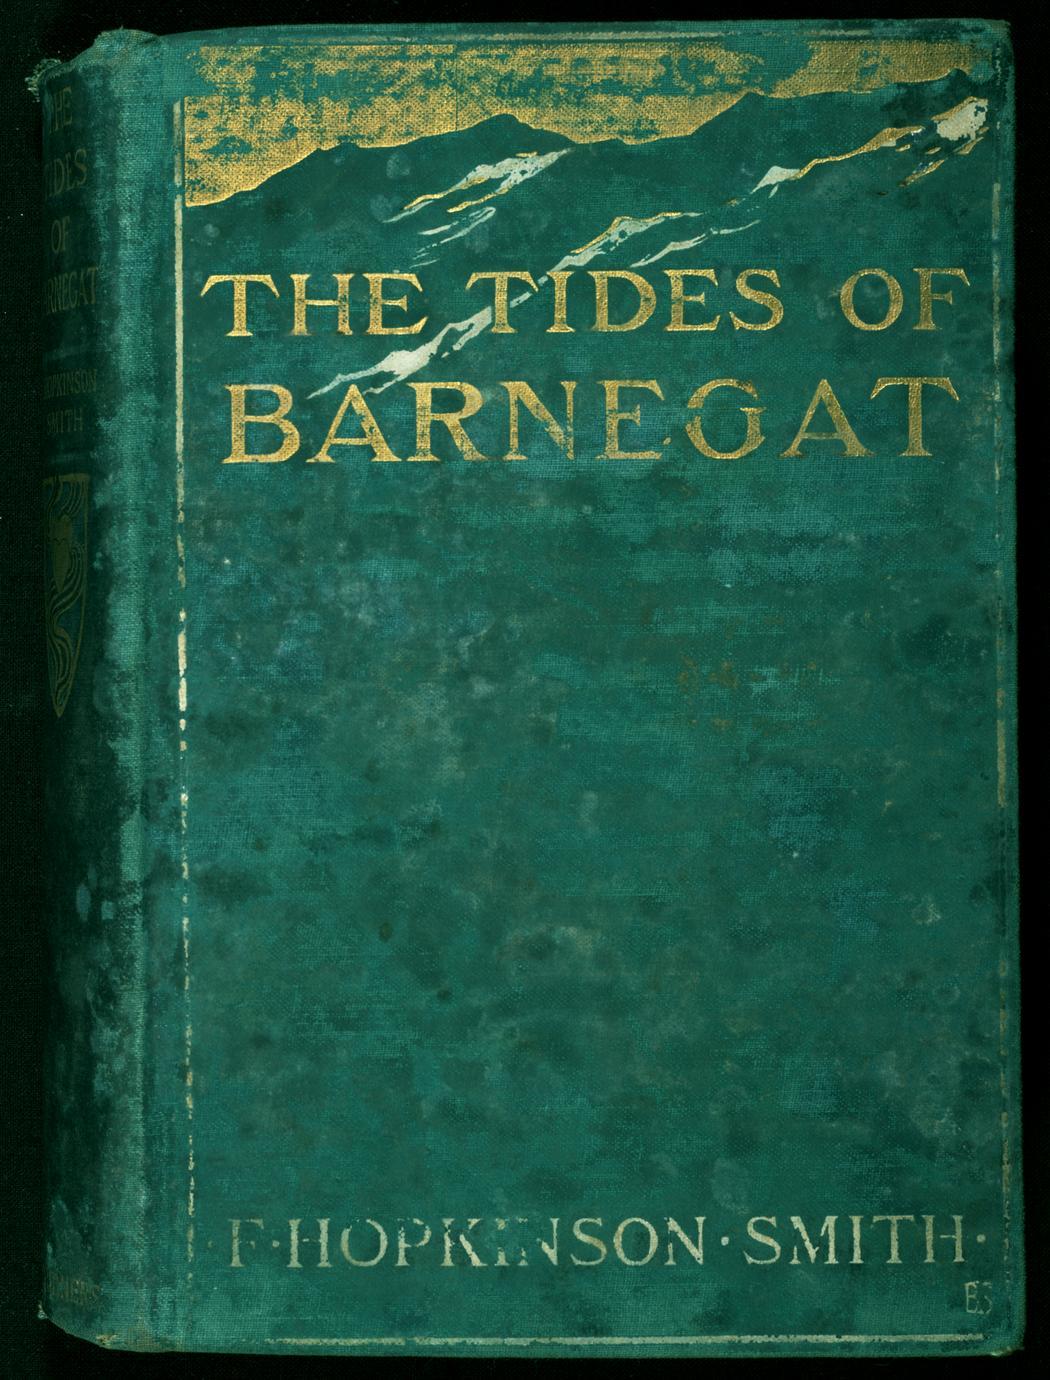 The tides of Barnegat (1 of 2)